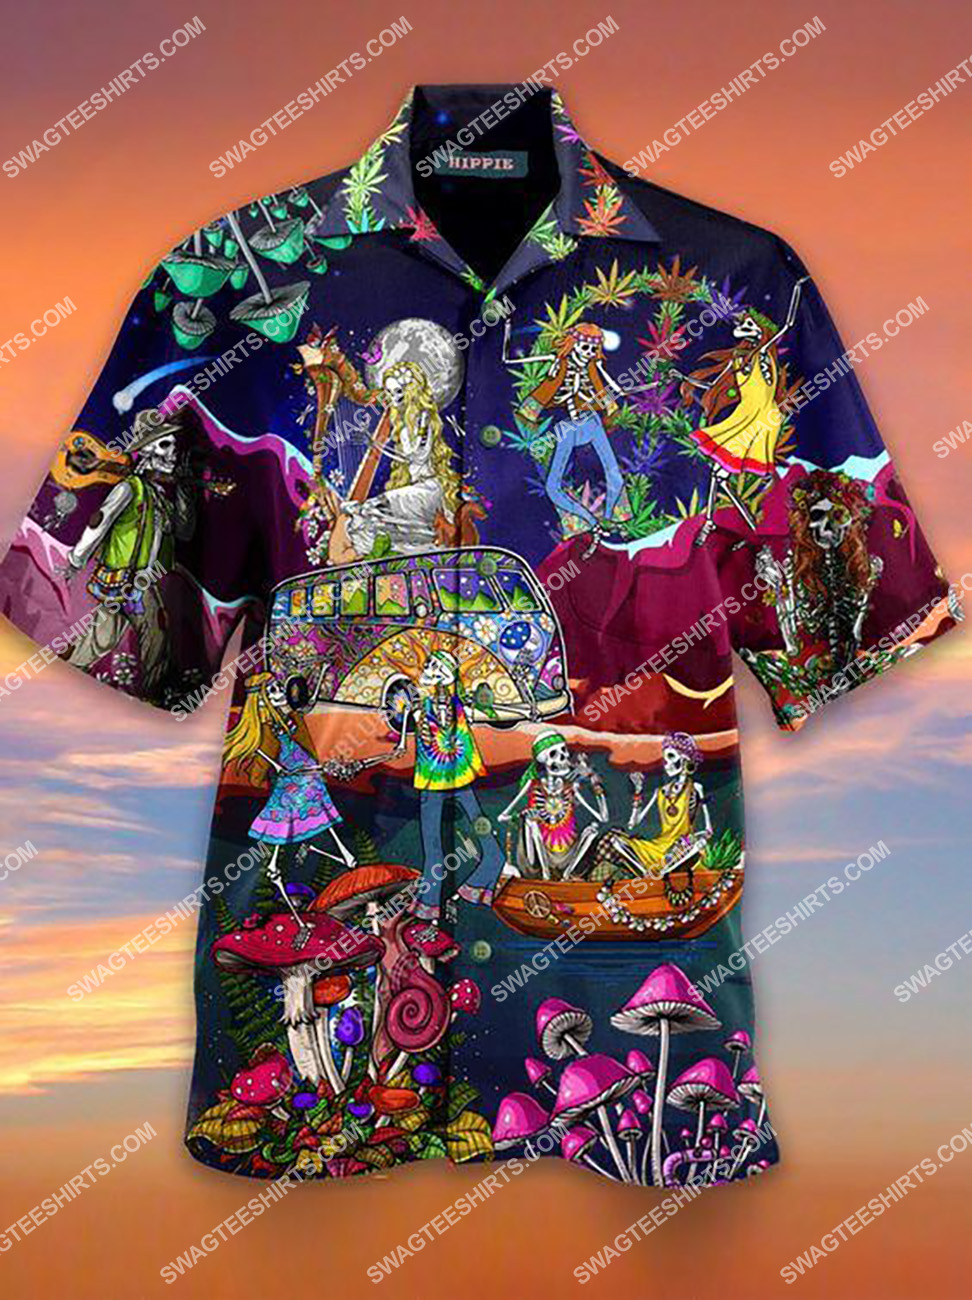 hippie lover skull all over printed hawaiian shirt 1(1) - Copy